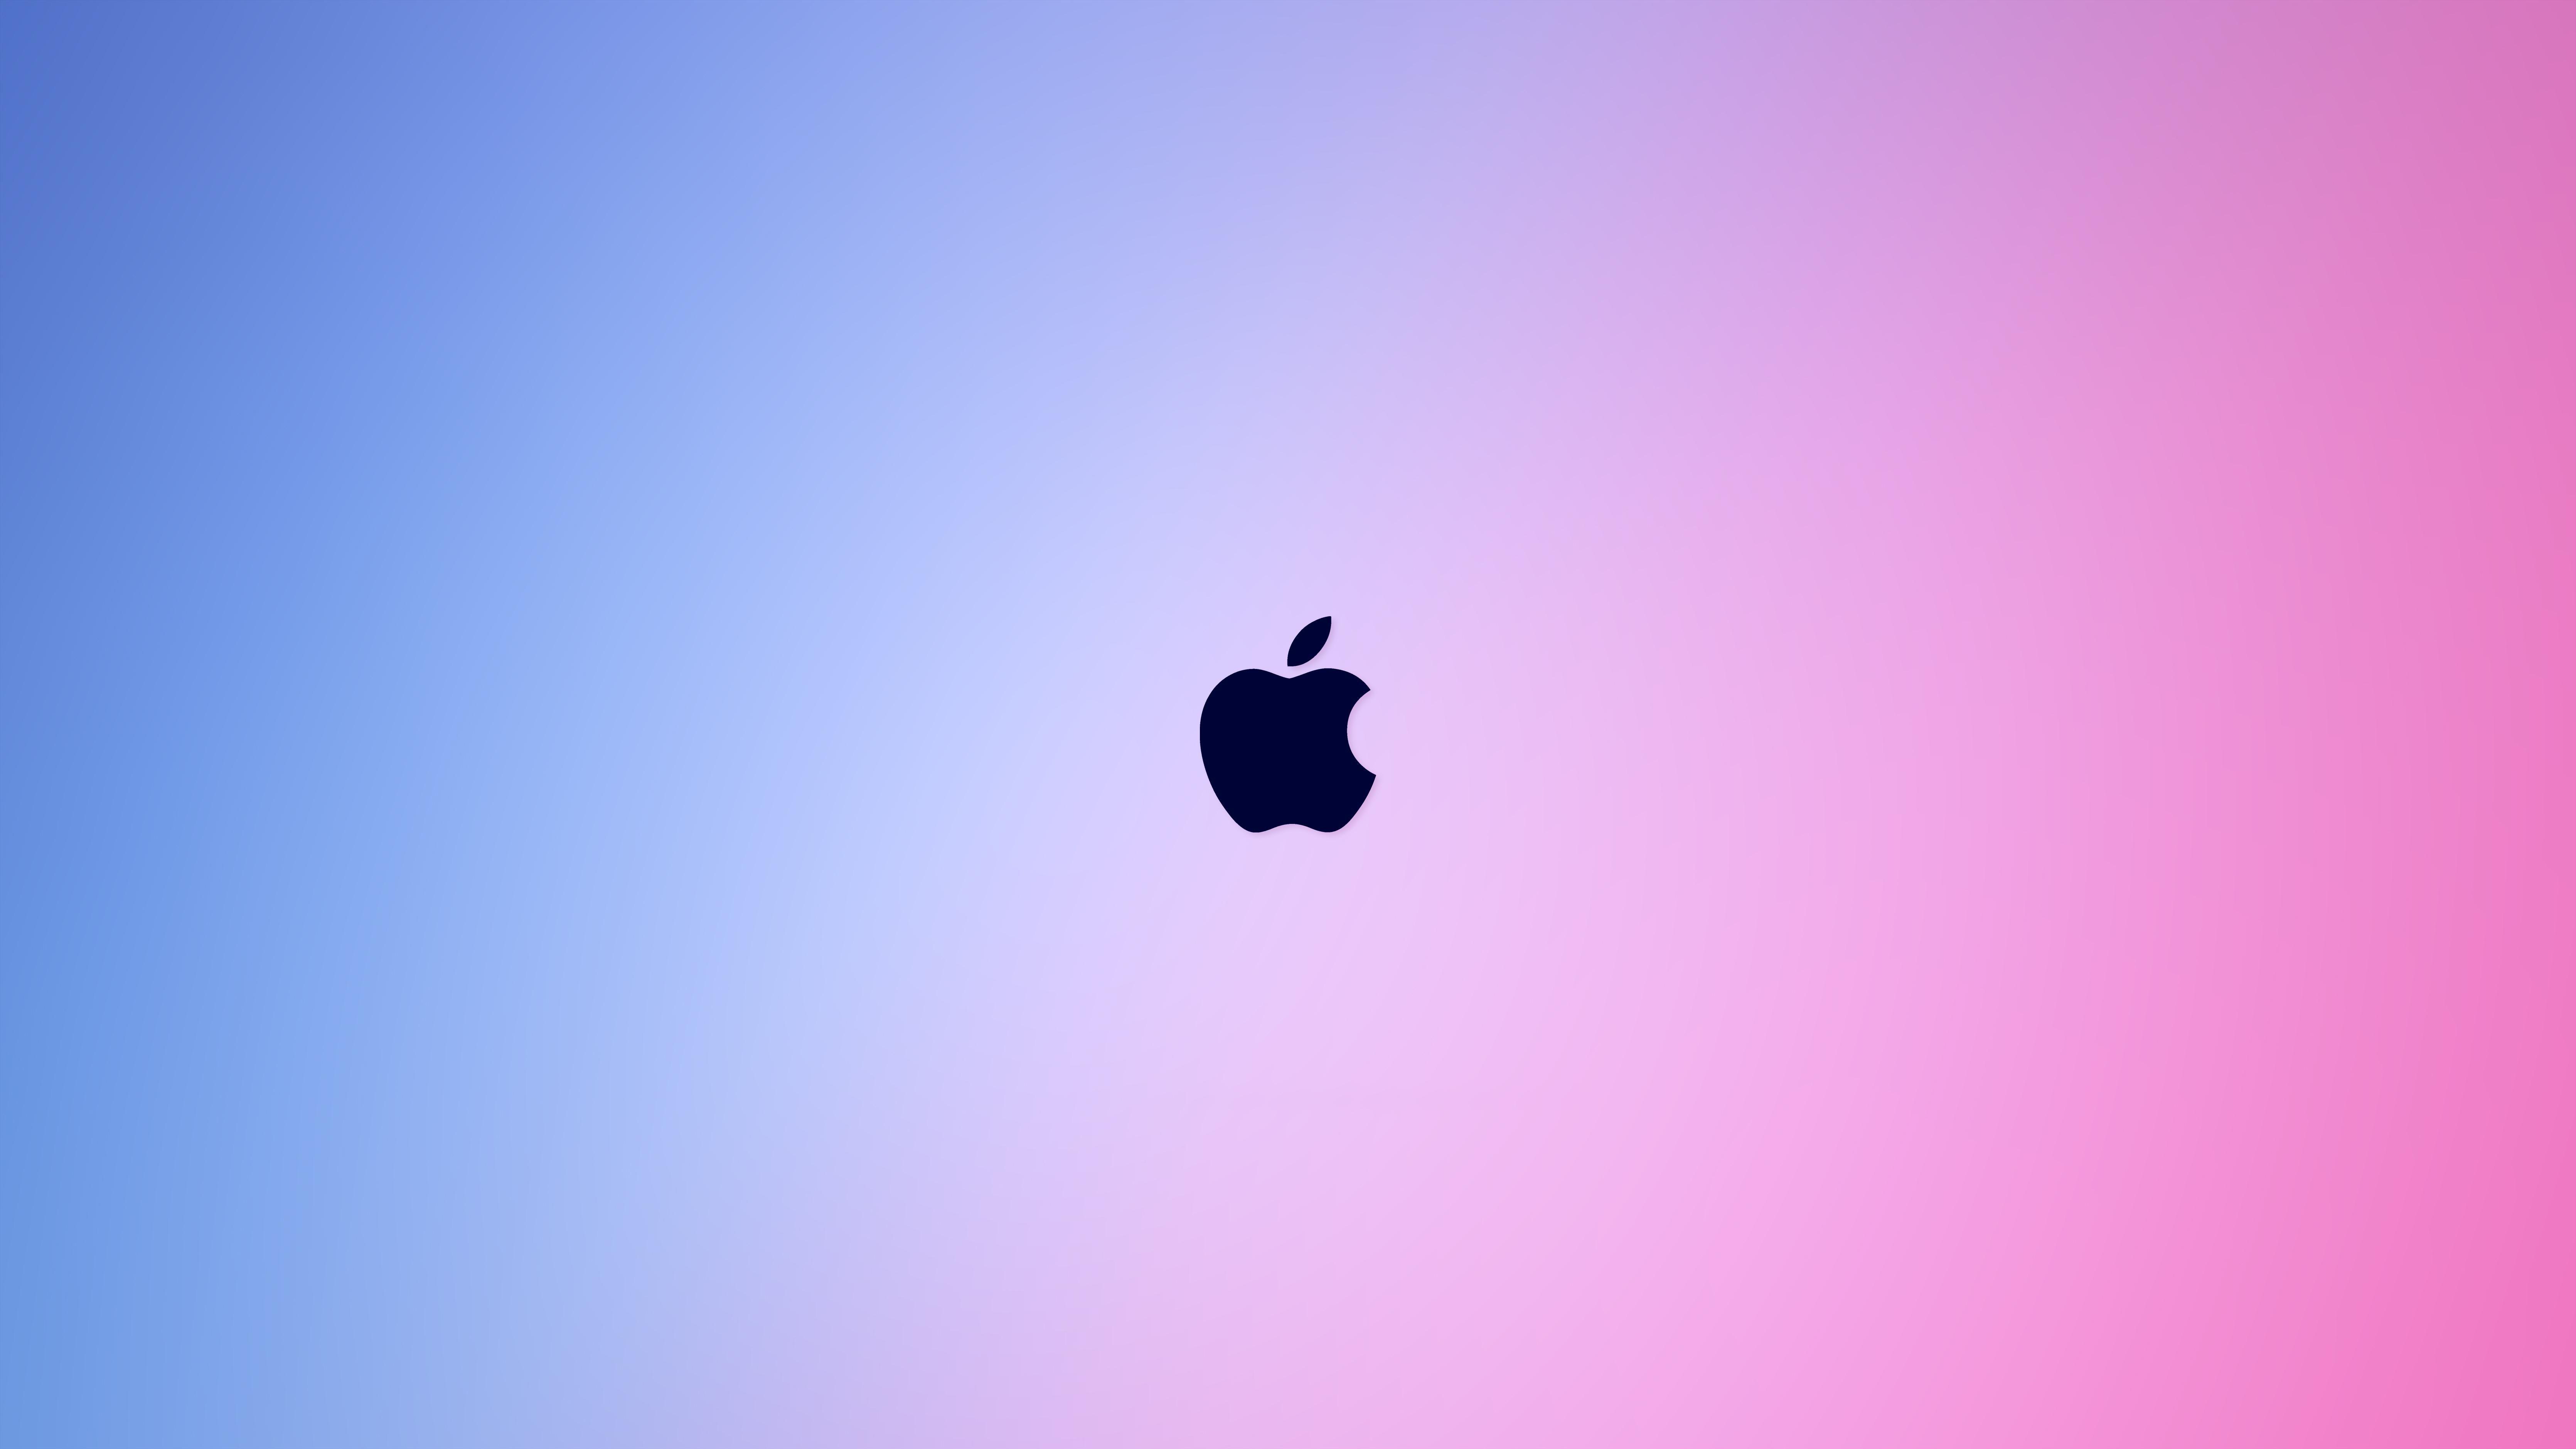 Cyan And Pink Desktop Wallpaper By Grafixart Photo Apple Version